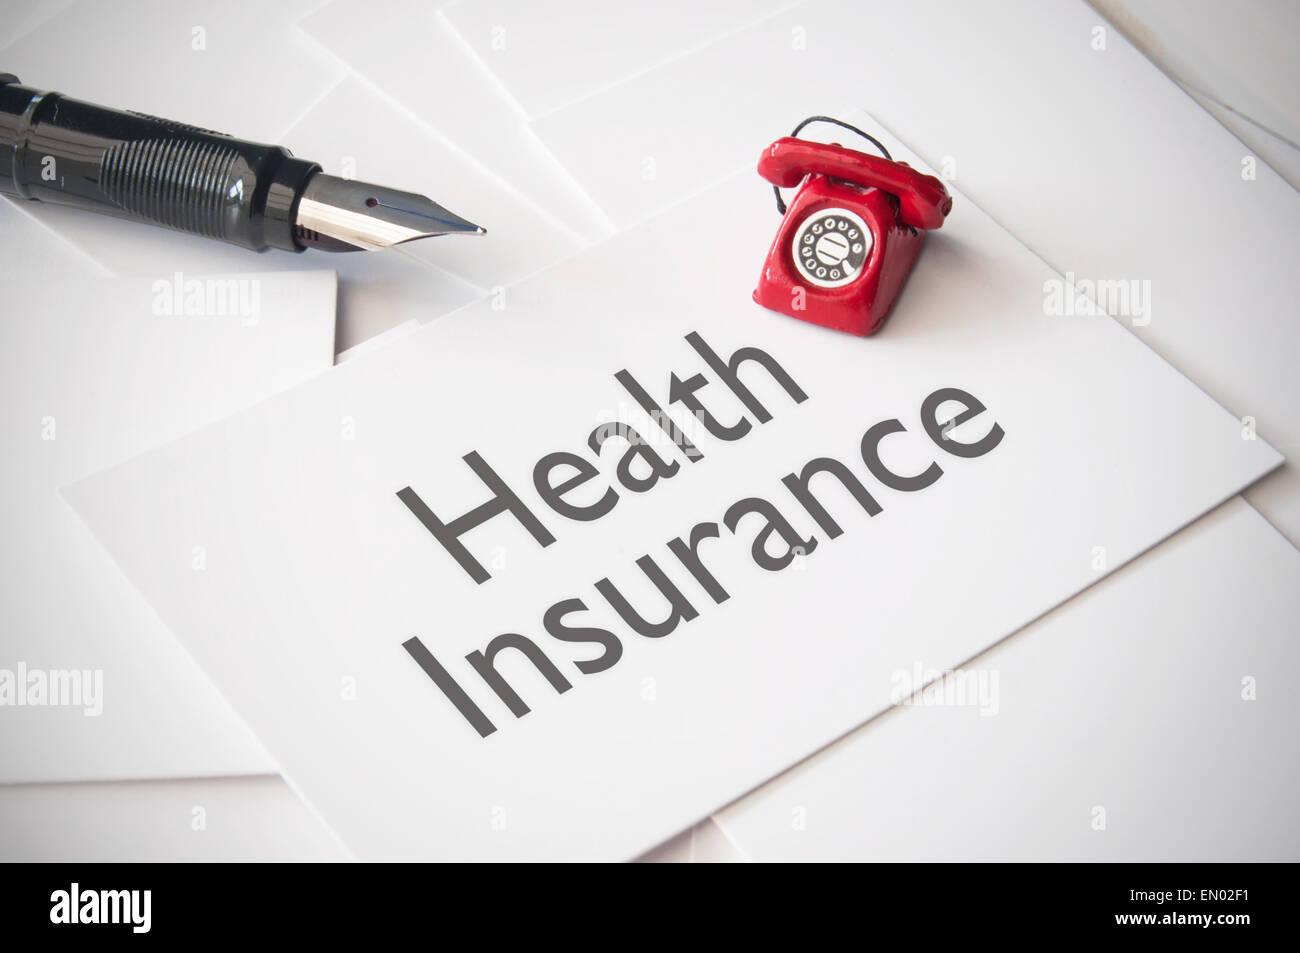 Health insurance concept - Stock Image